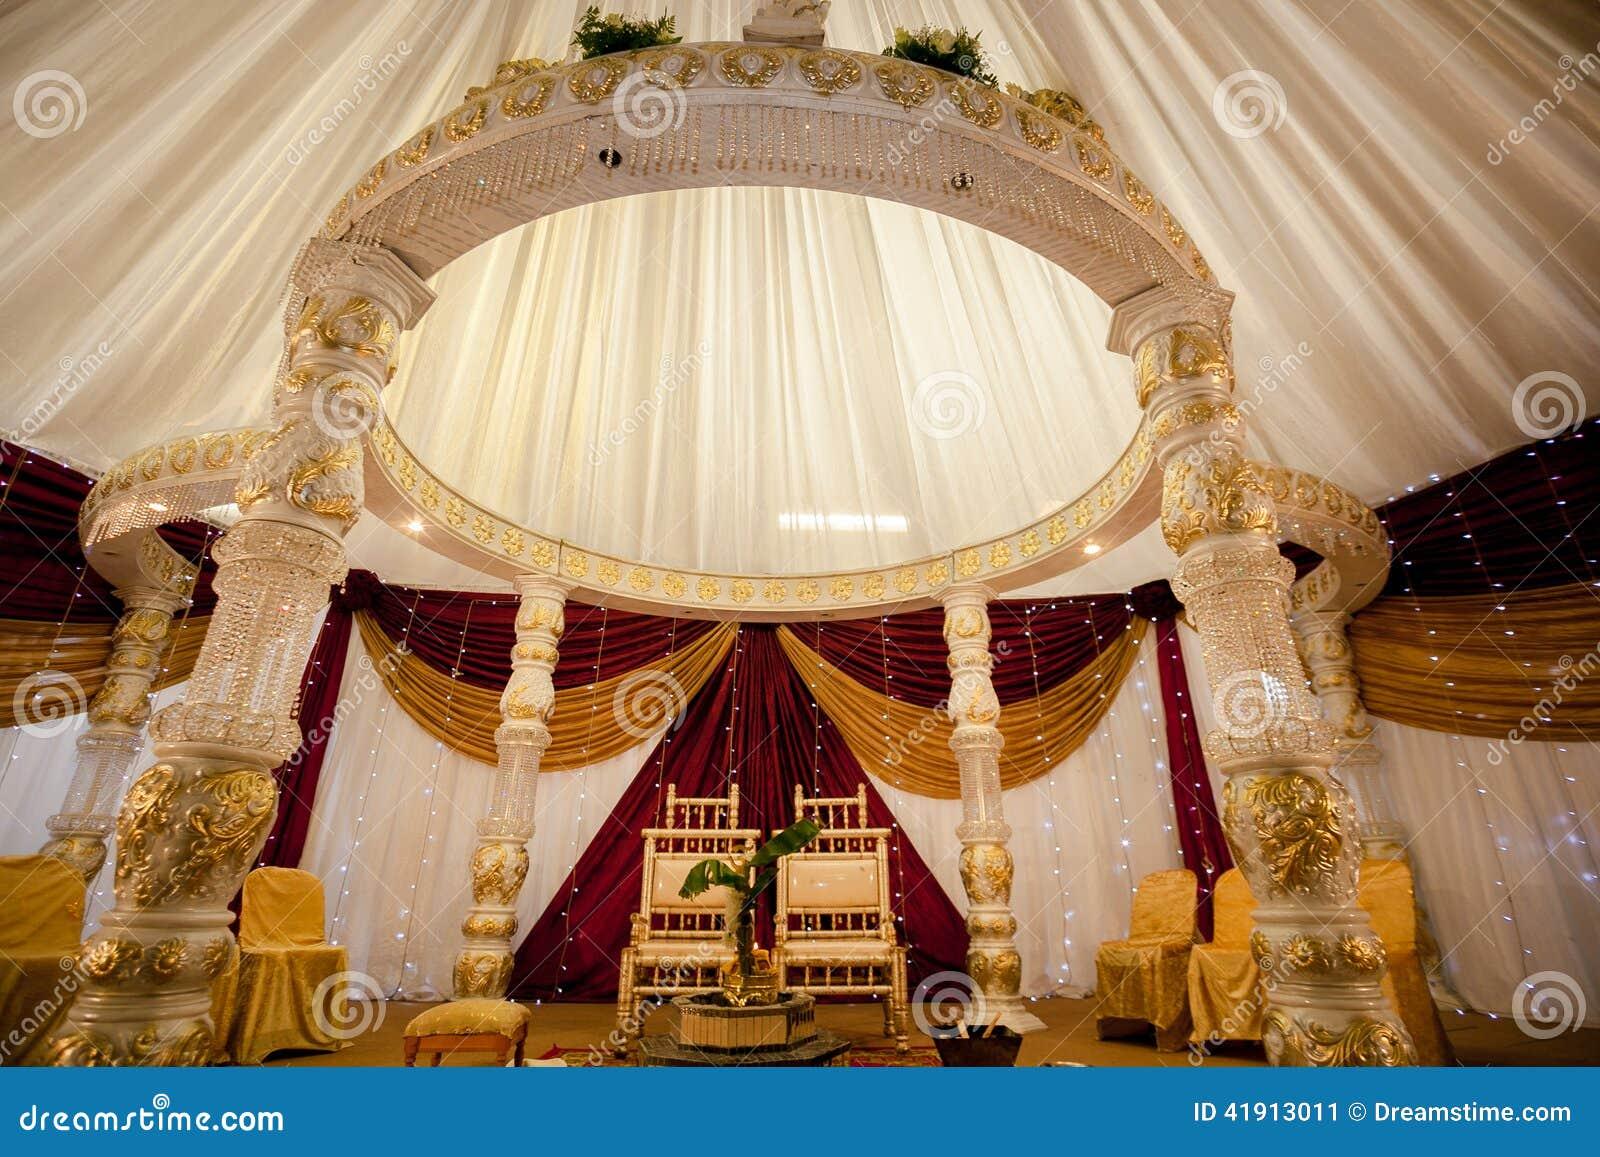 Wedding Decor Stock Image Image Of Beautiful Hindu 41913011